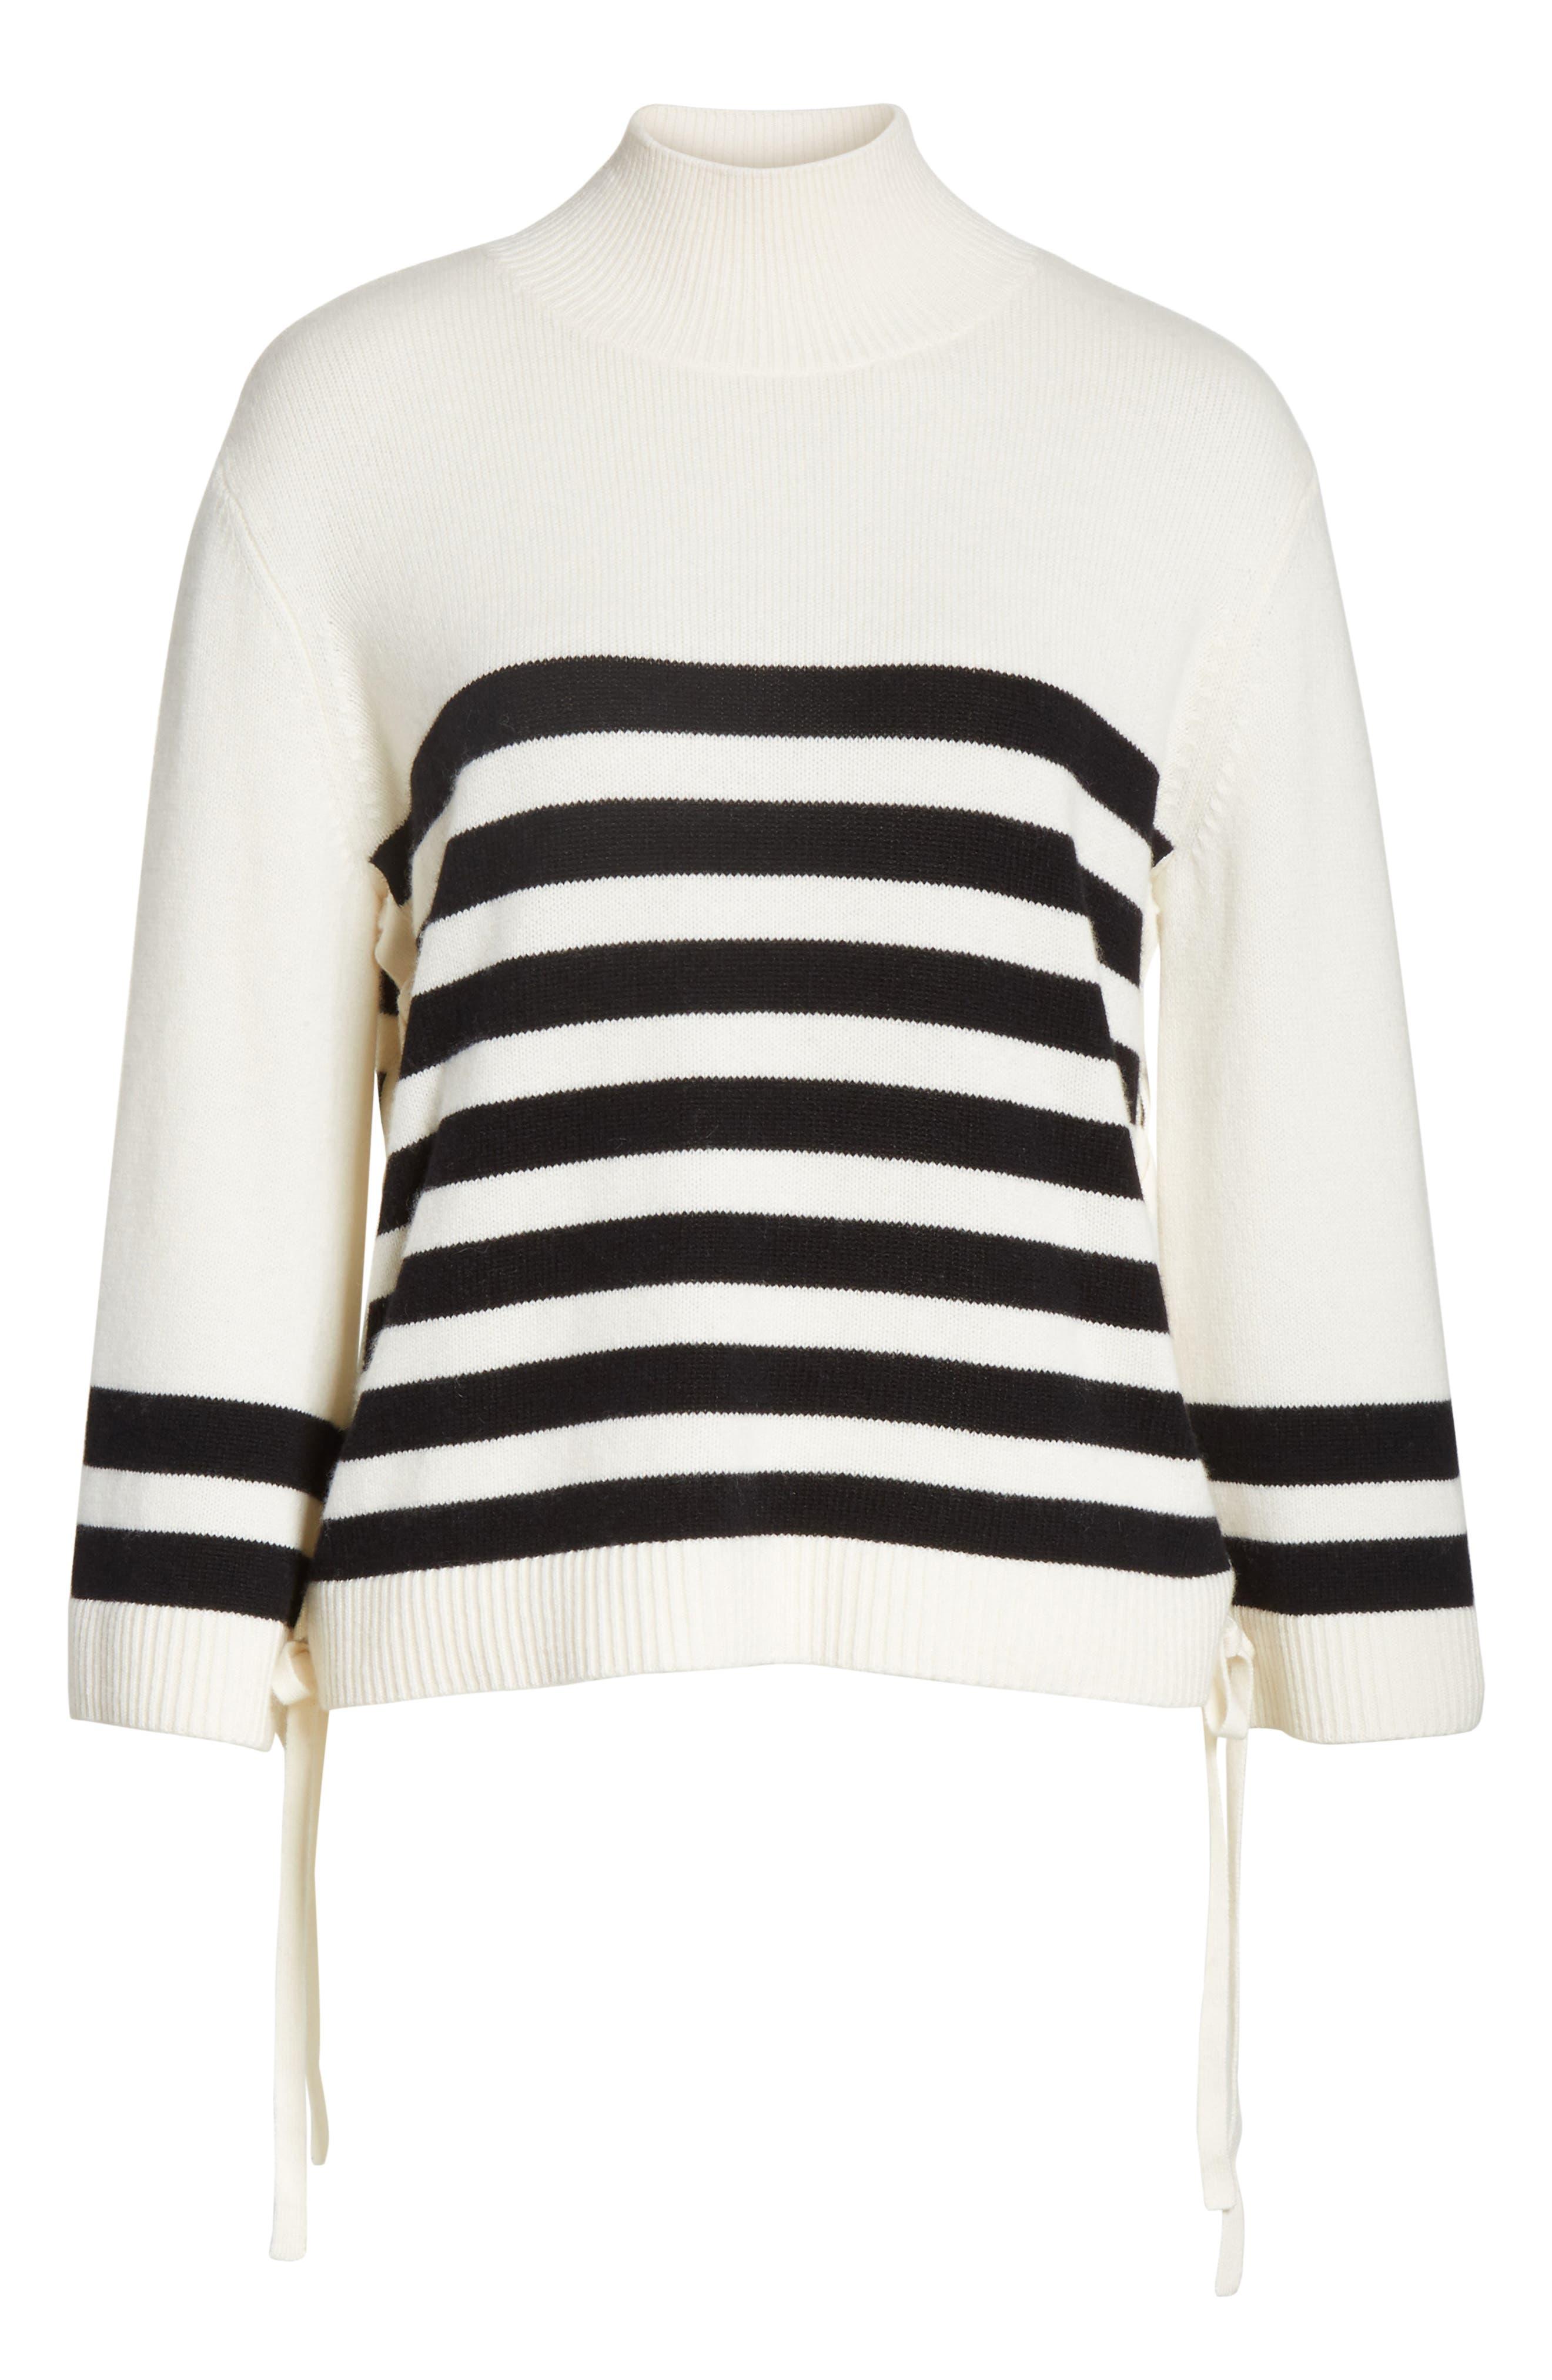 Lantz Mariner Sweater,                             Alternate thumbnail 6, color,                             Porcelain/ Caviar